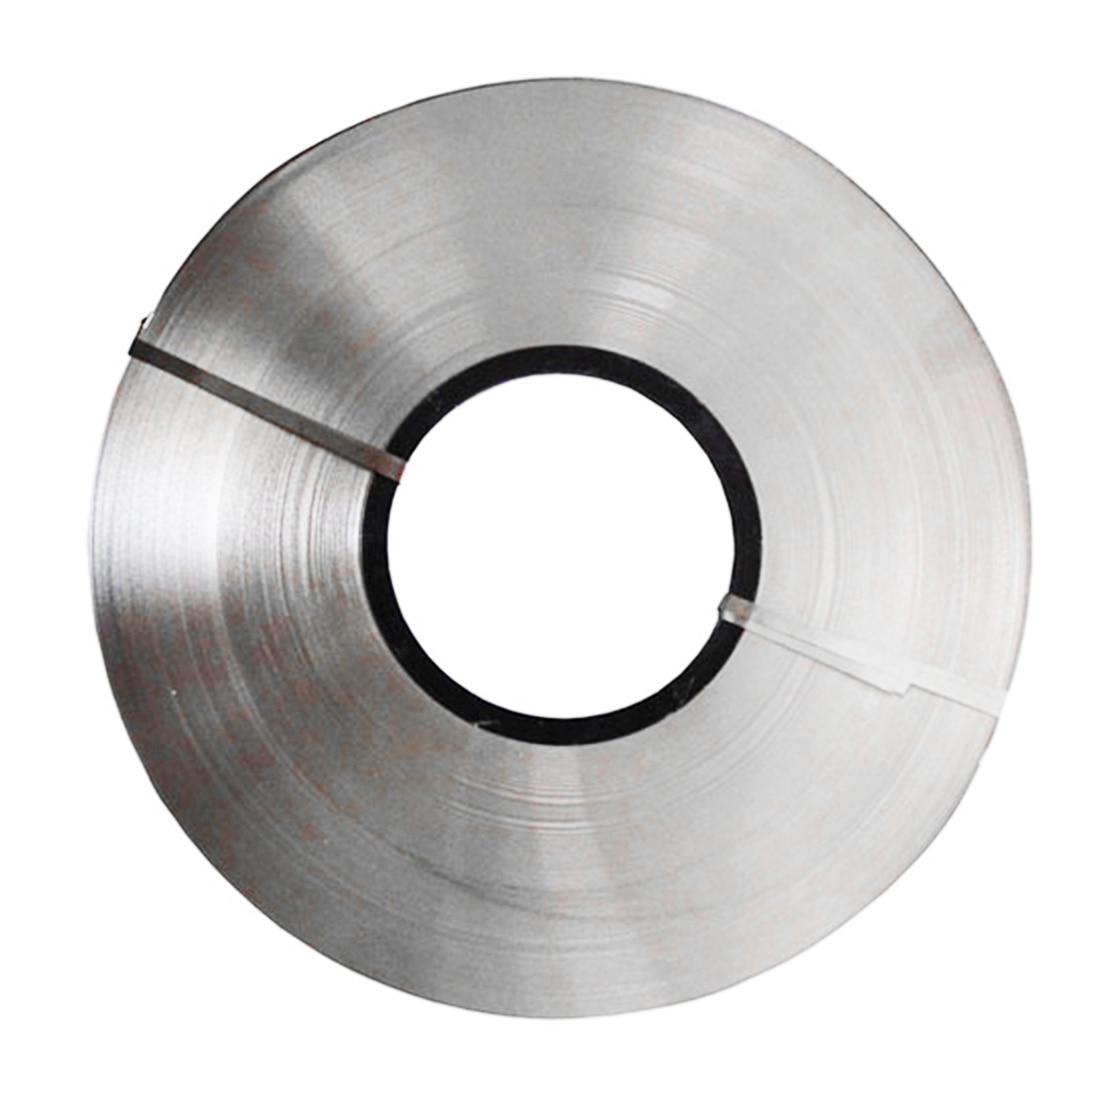 Nickel Strip Tape 8Mm X 0.1Mm Ni Plate Nickel Strip Tape Length for Li 18650 Battery Spot Welding Nickel Strips Battery Nickel Strip